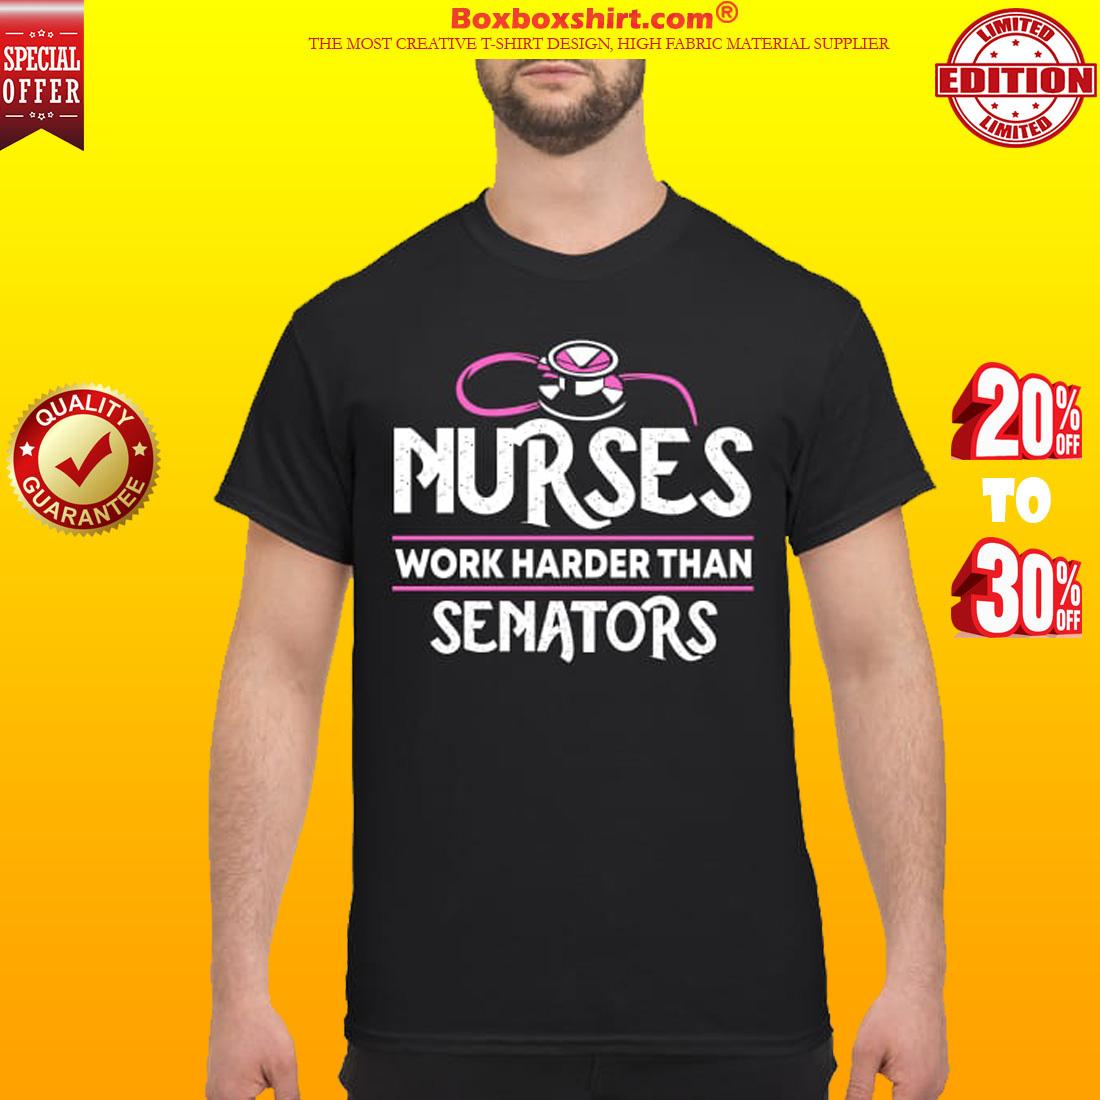 Nurses work harder than senators classic shirt